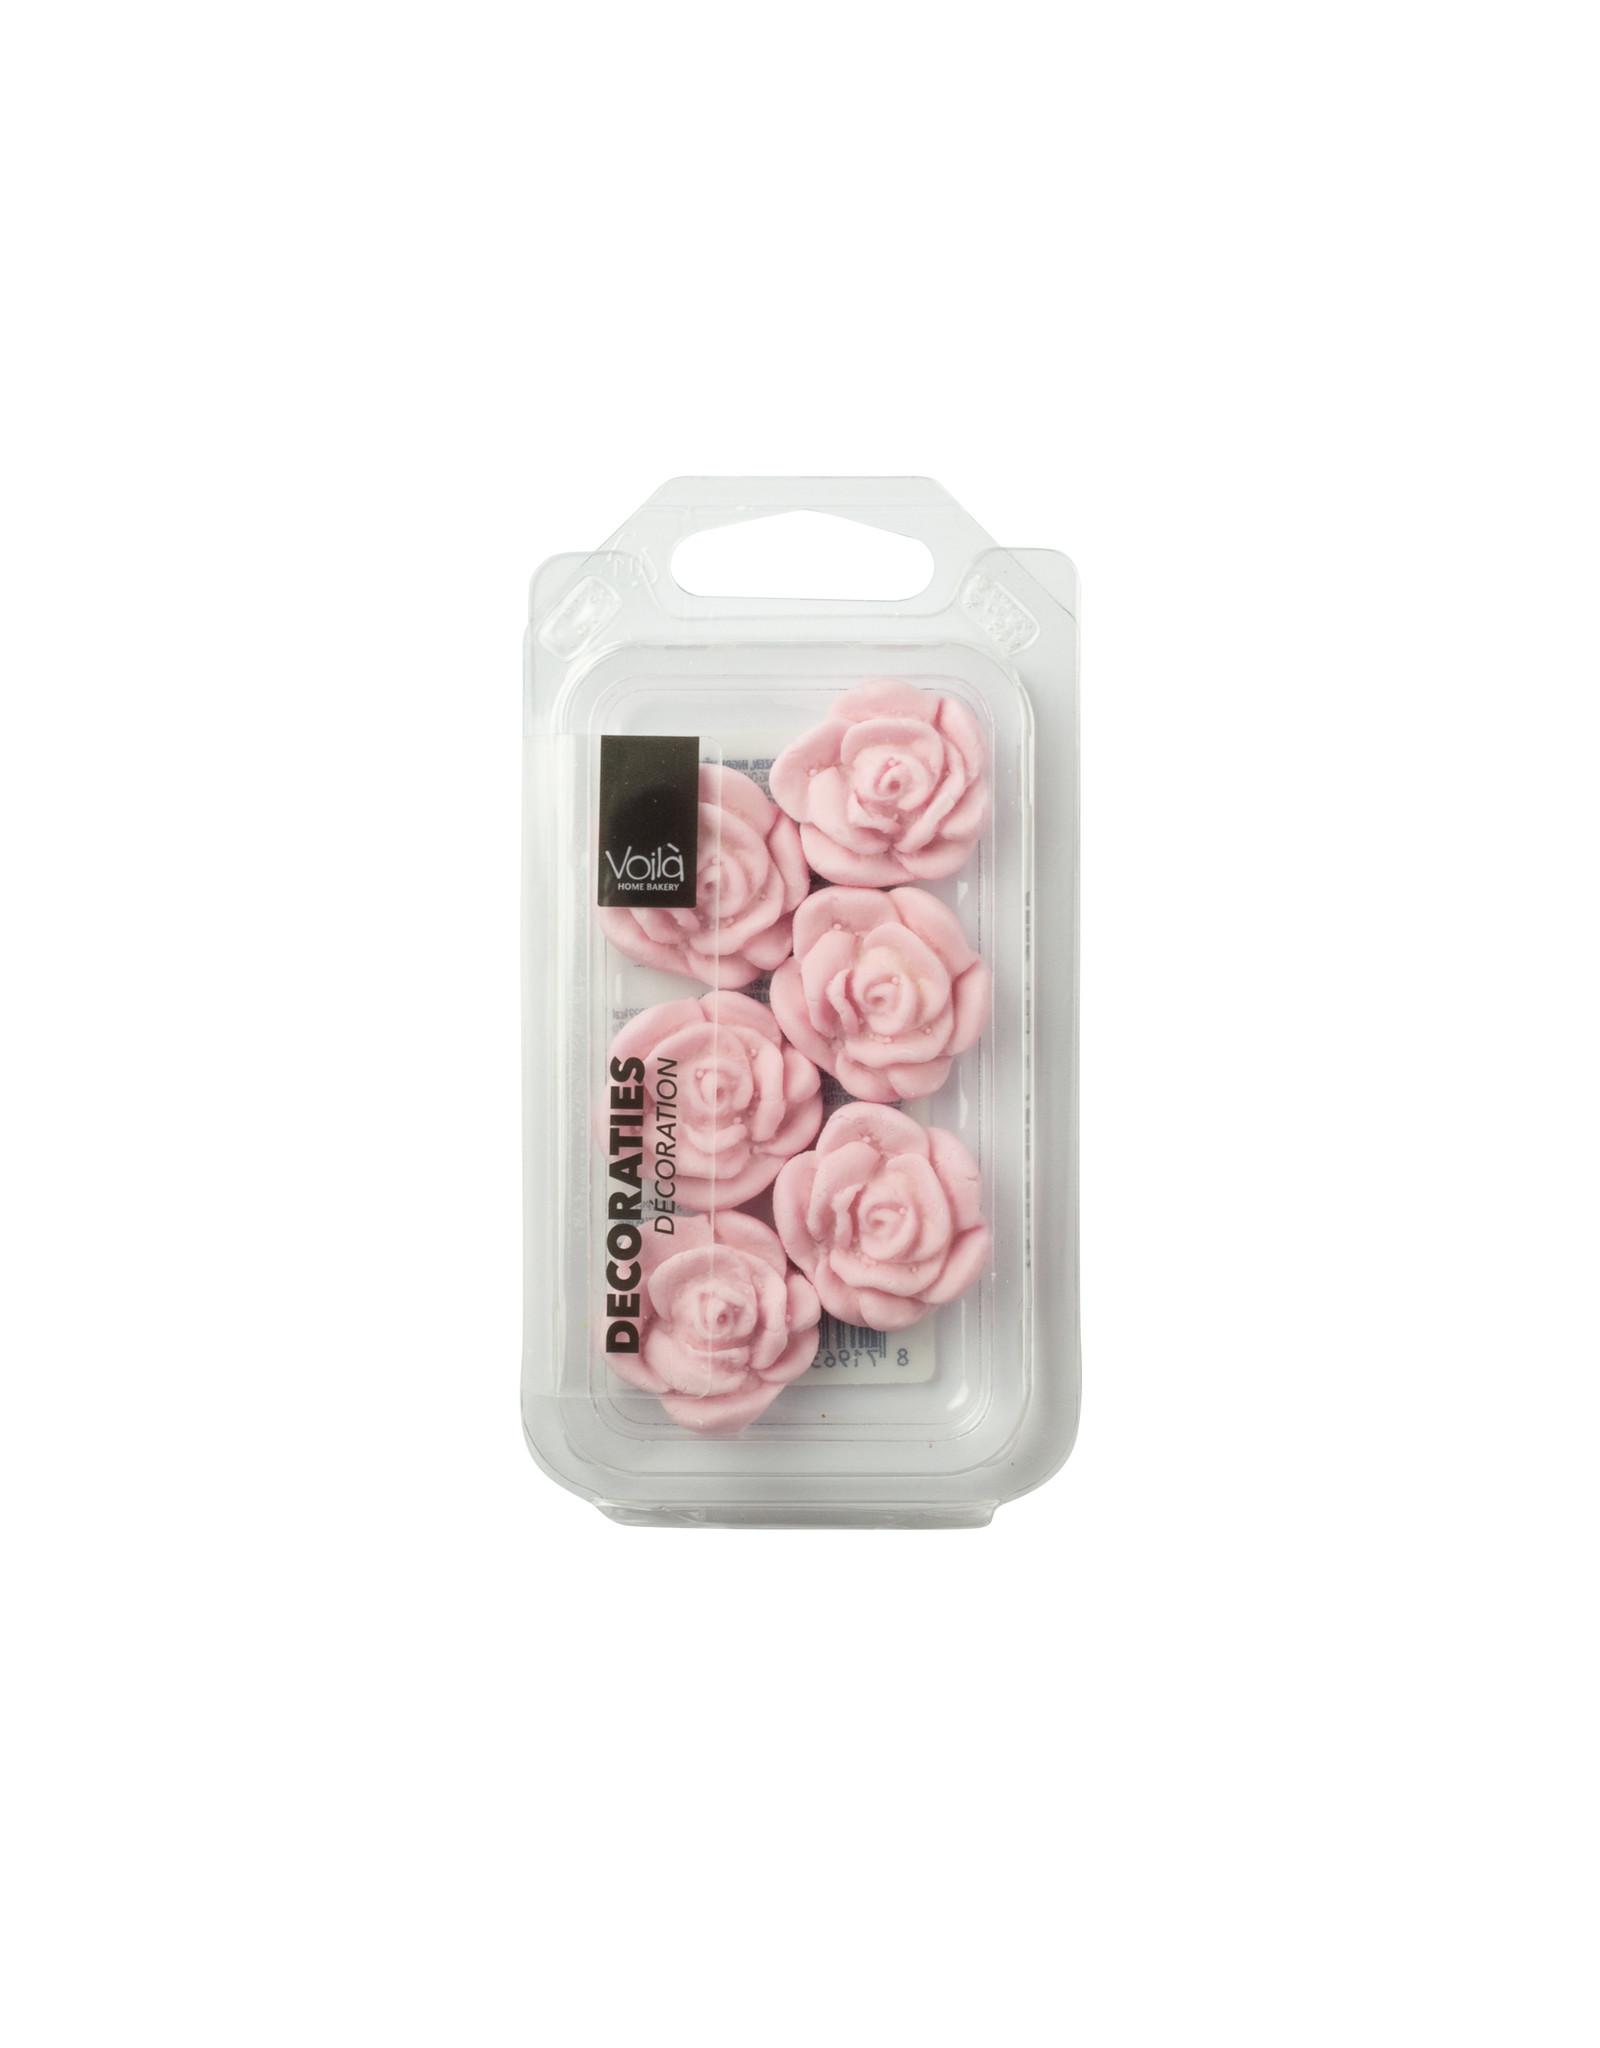 VOILA Home Bakery Voila Suikerdecoratie Roze Rozen - 22x 18 gram